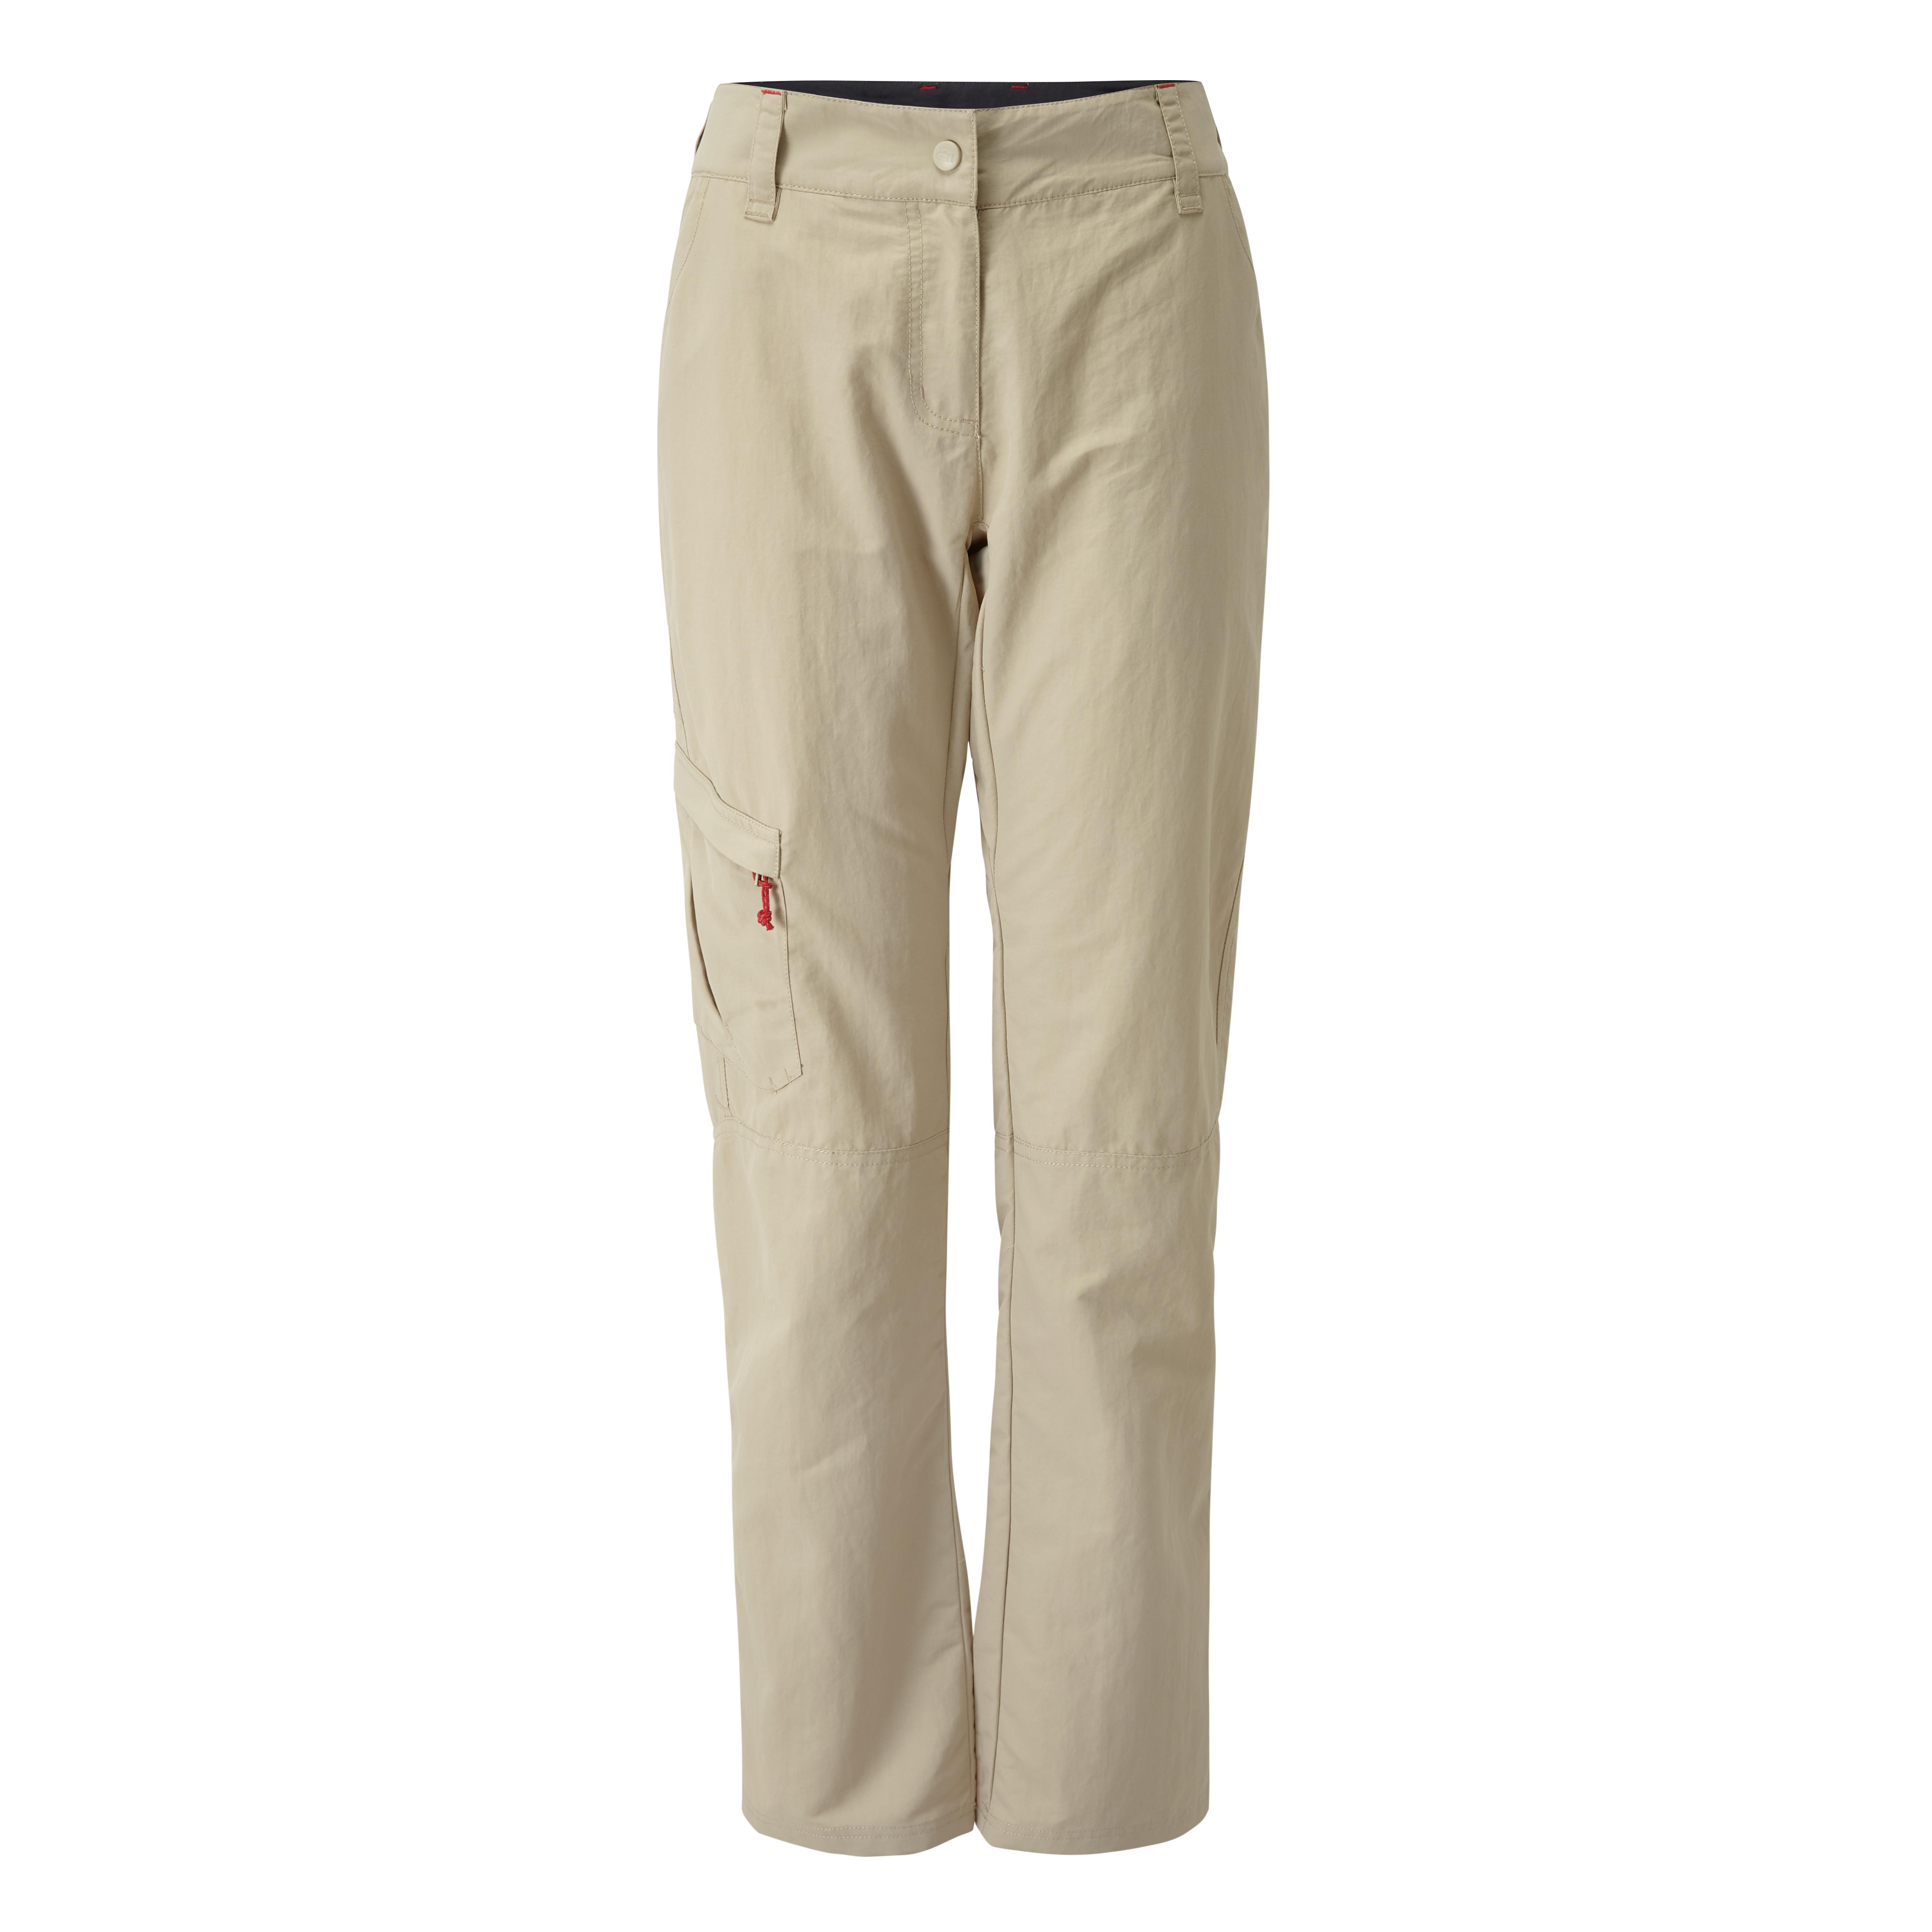 Women's UV Tec Trousers - UV014W-KHA01-1.jpg